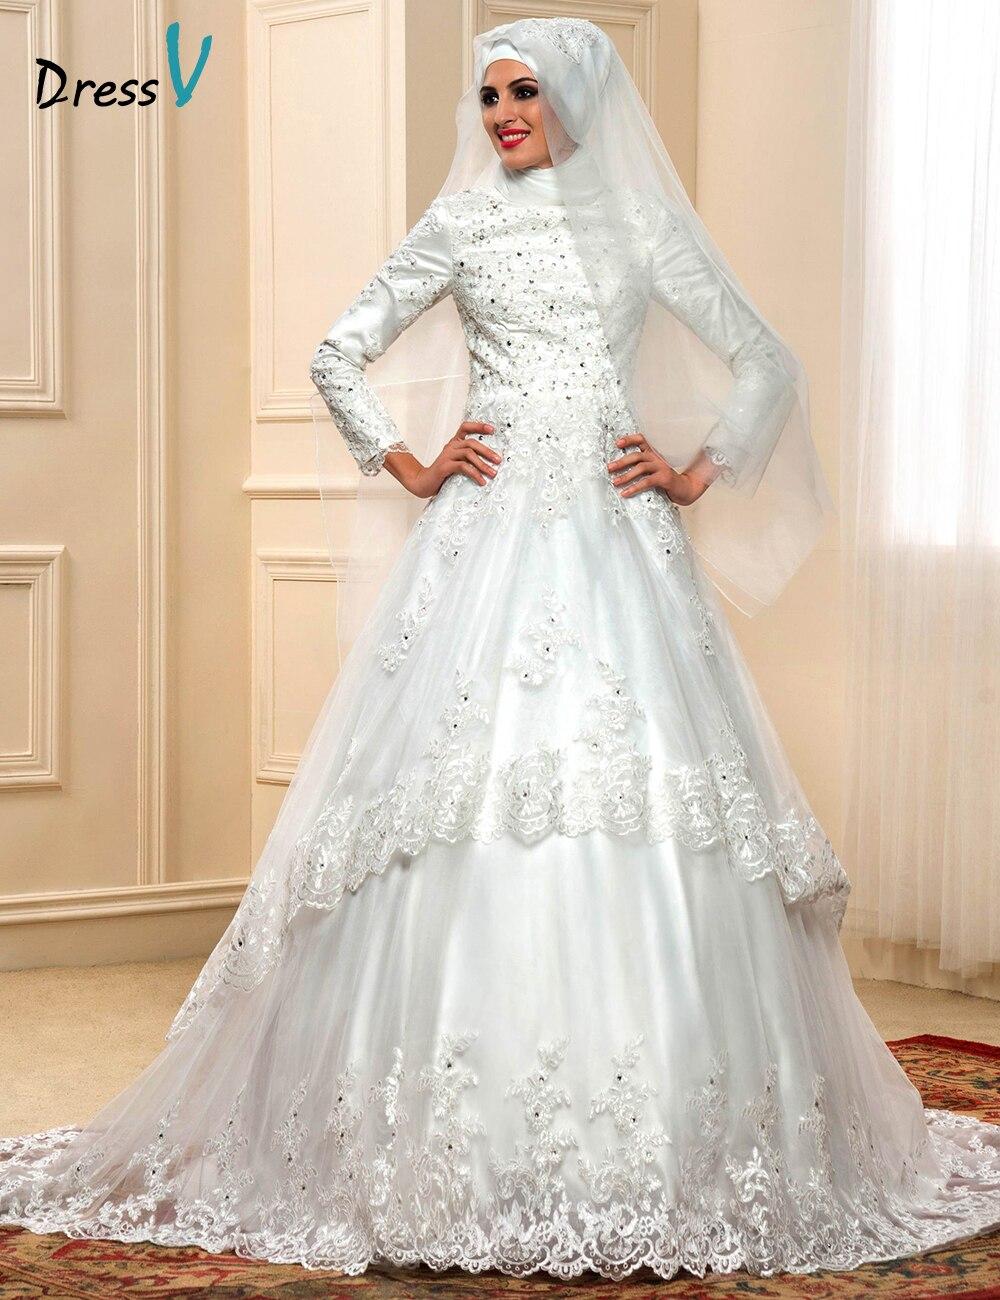 Dressv Elegant Muslim Turtleneck Wedding Dresses with Long Sleeves ...